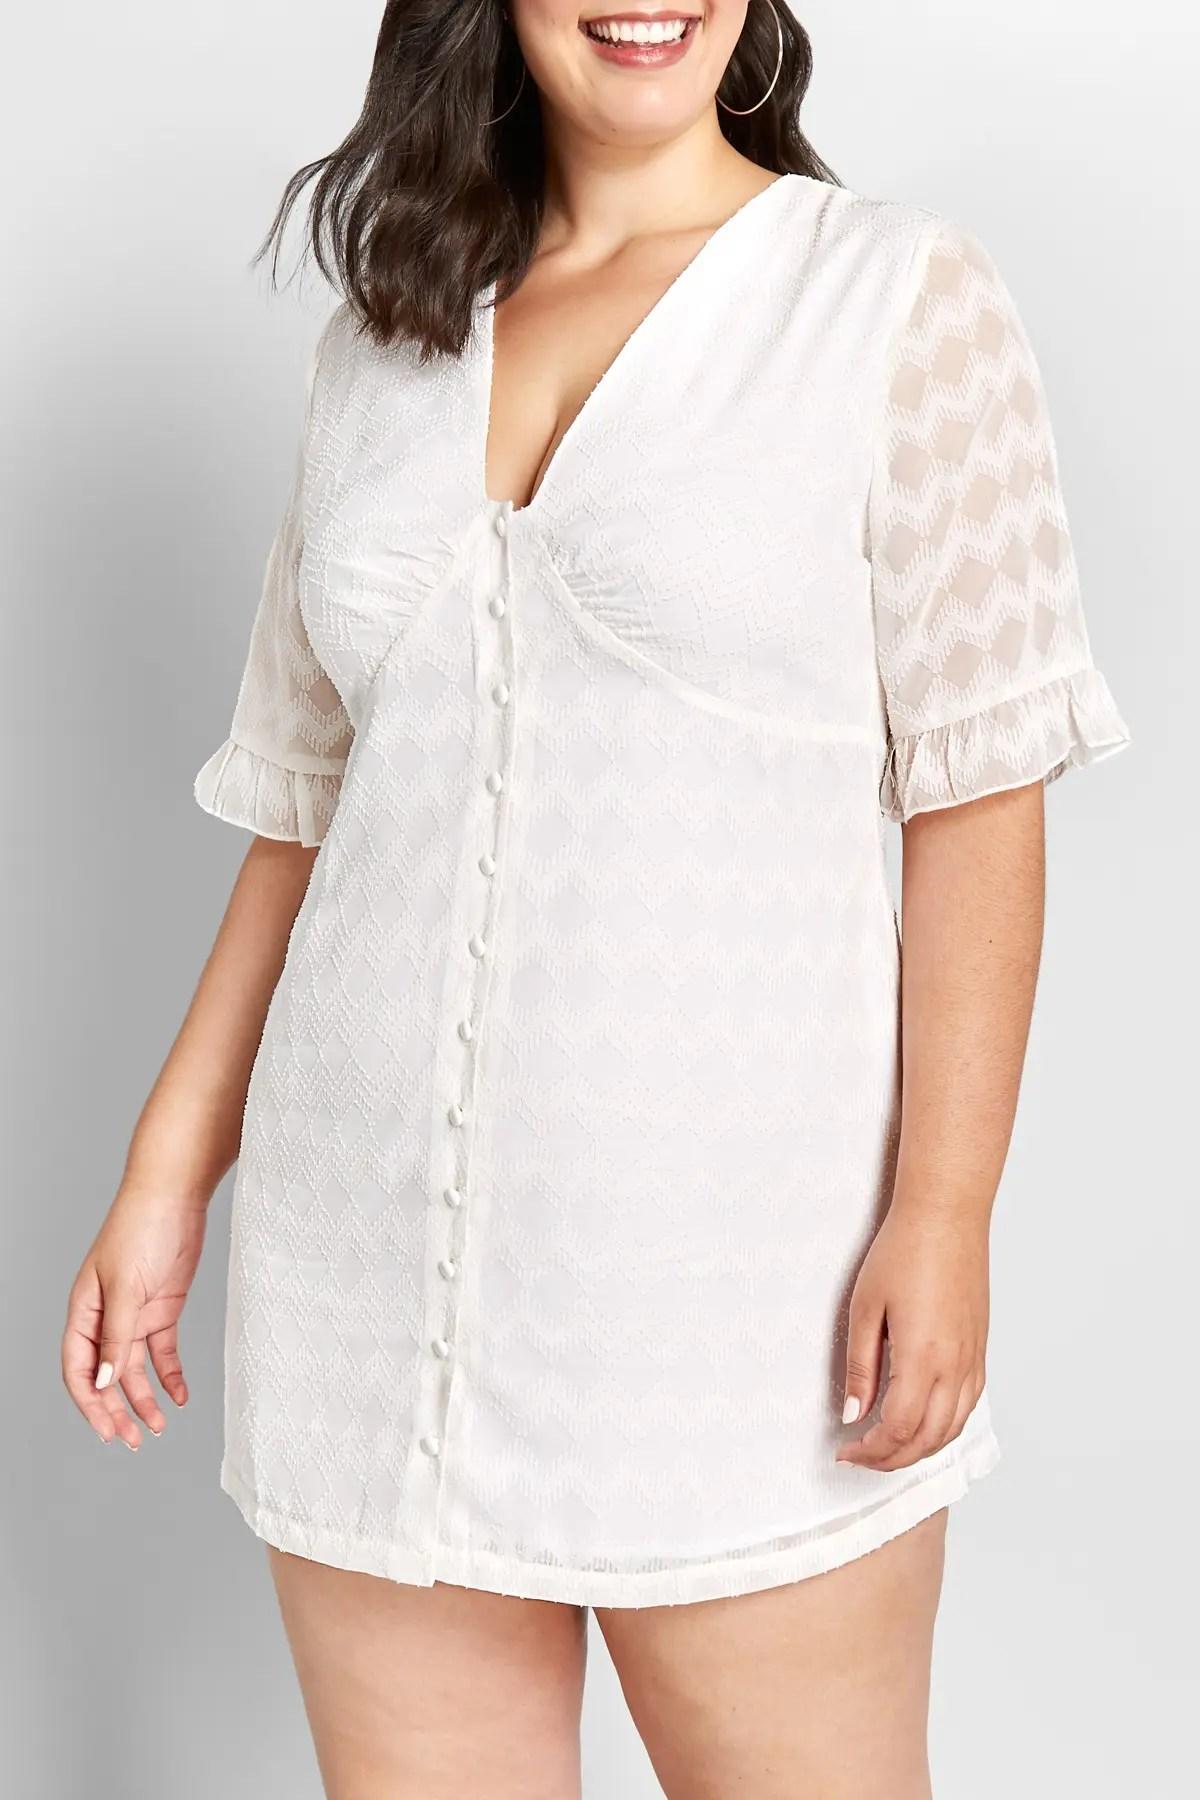 https www nordstromrack com brands modcloth women clothing plus size dresses